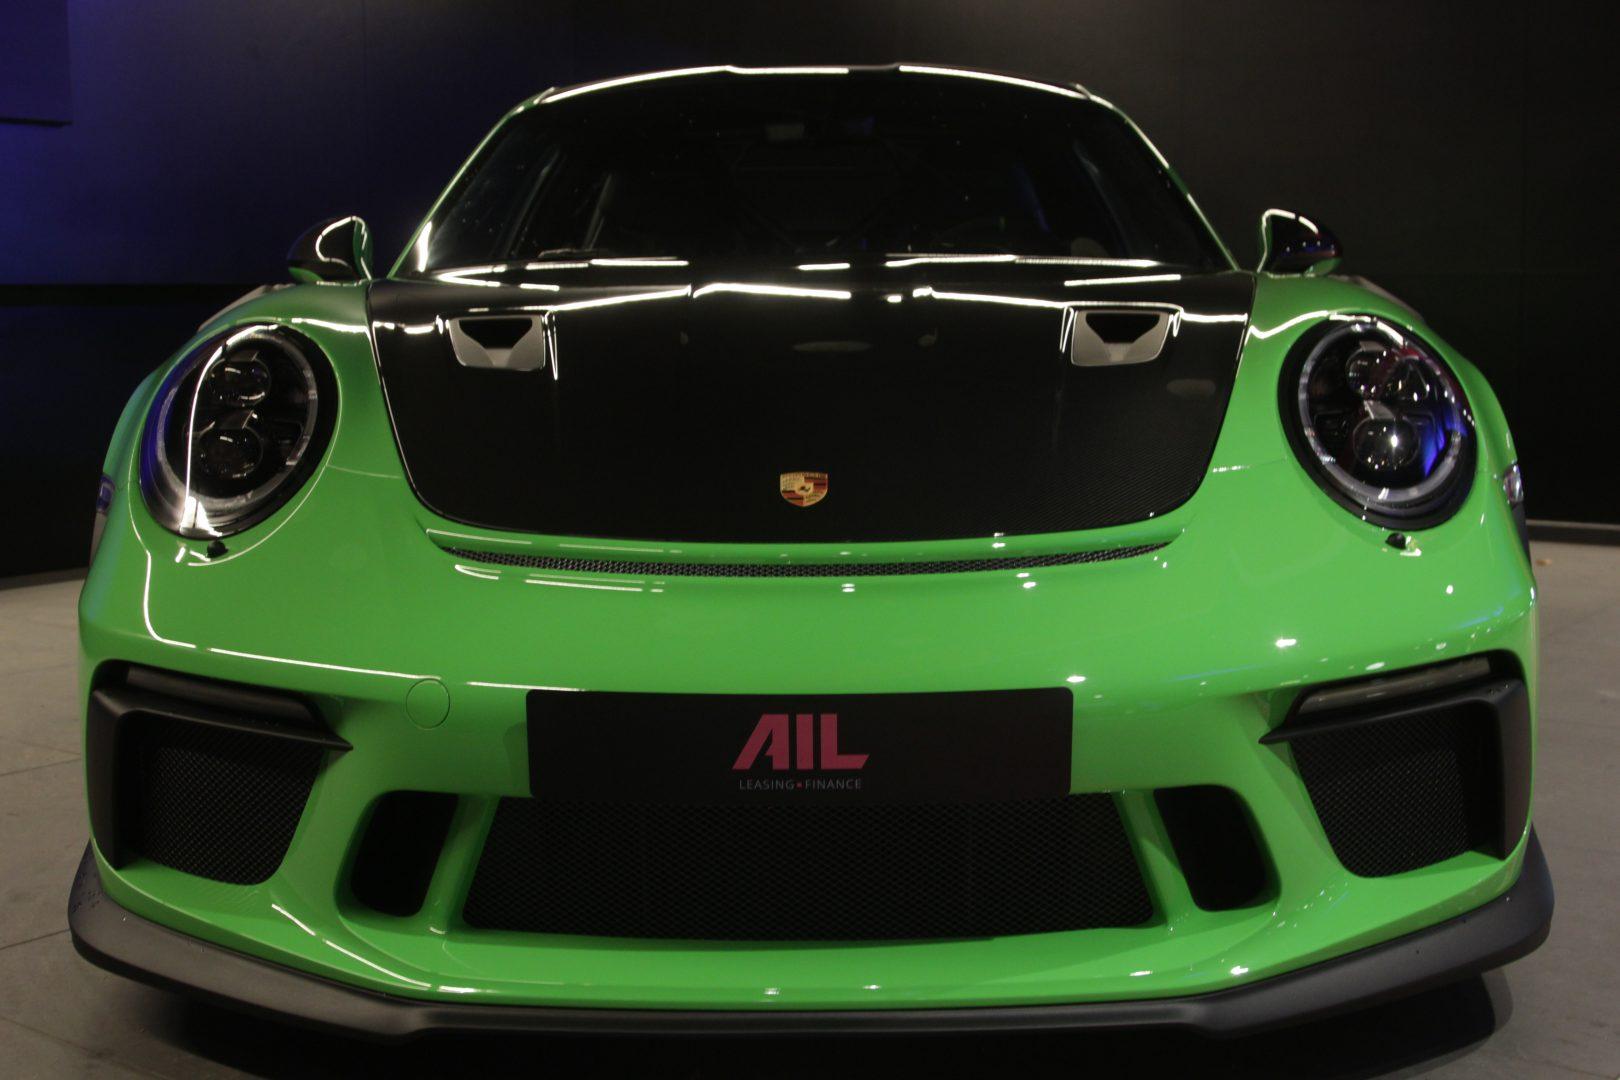 AIL Porsche 991 GT3 RS Weissach-Paket 11